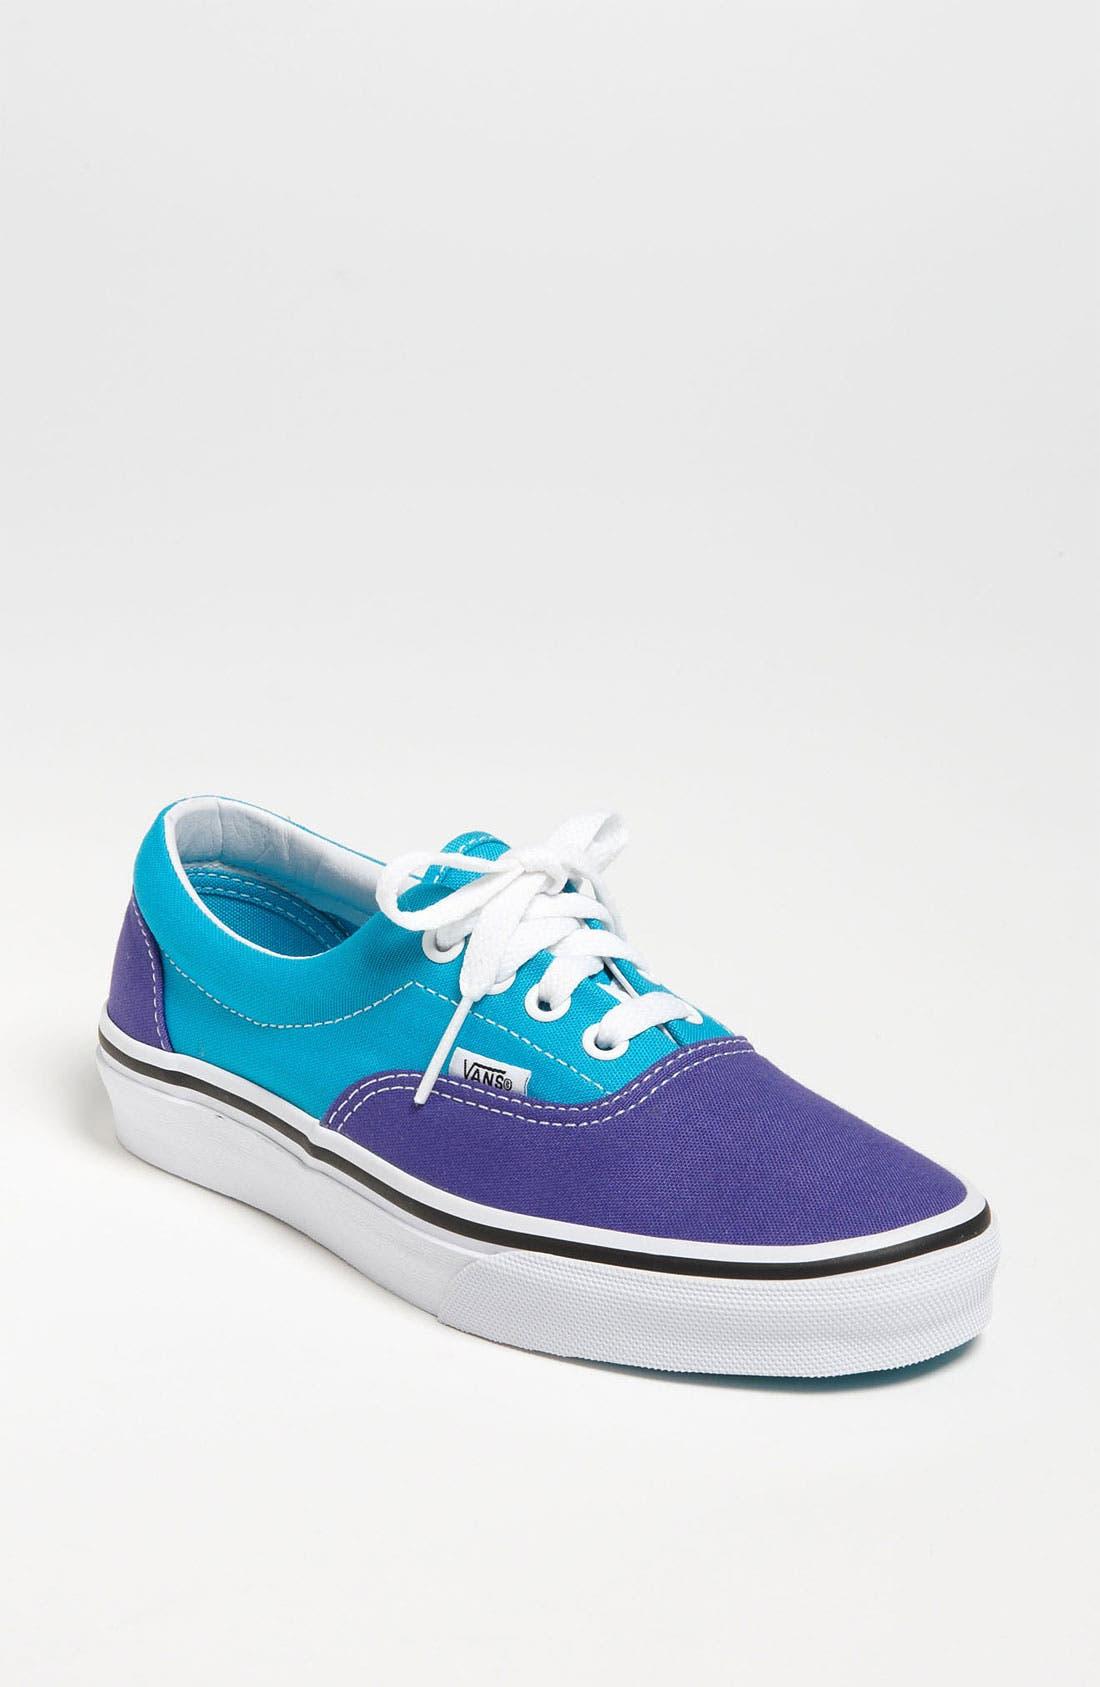 Alternate Image 1 Selected - Vans 'Era - Two Tone' Sneaker (Women)